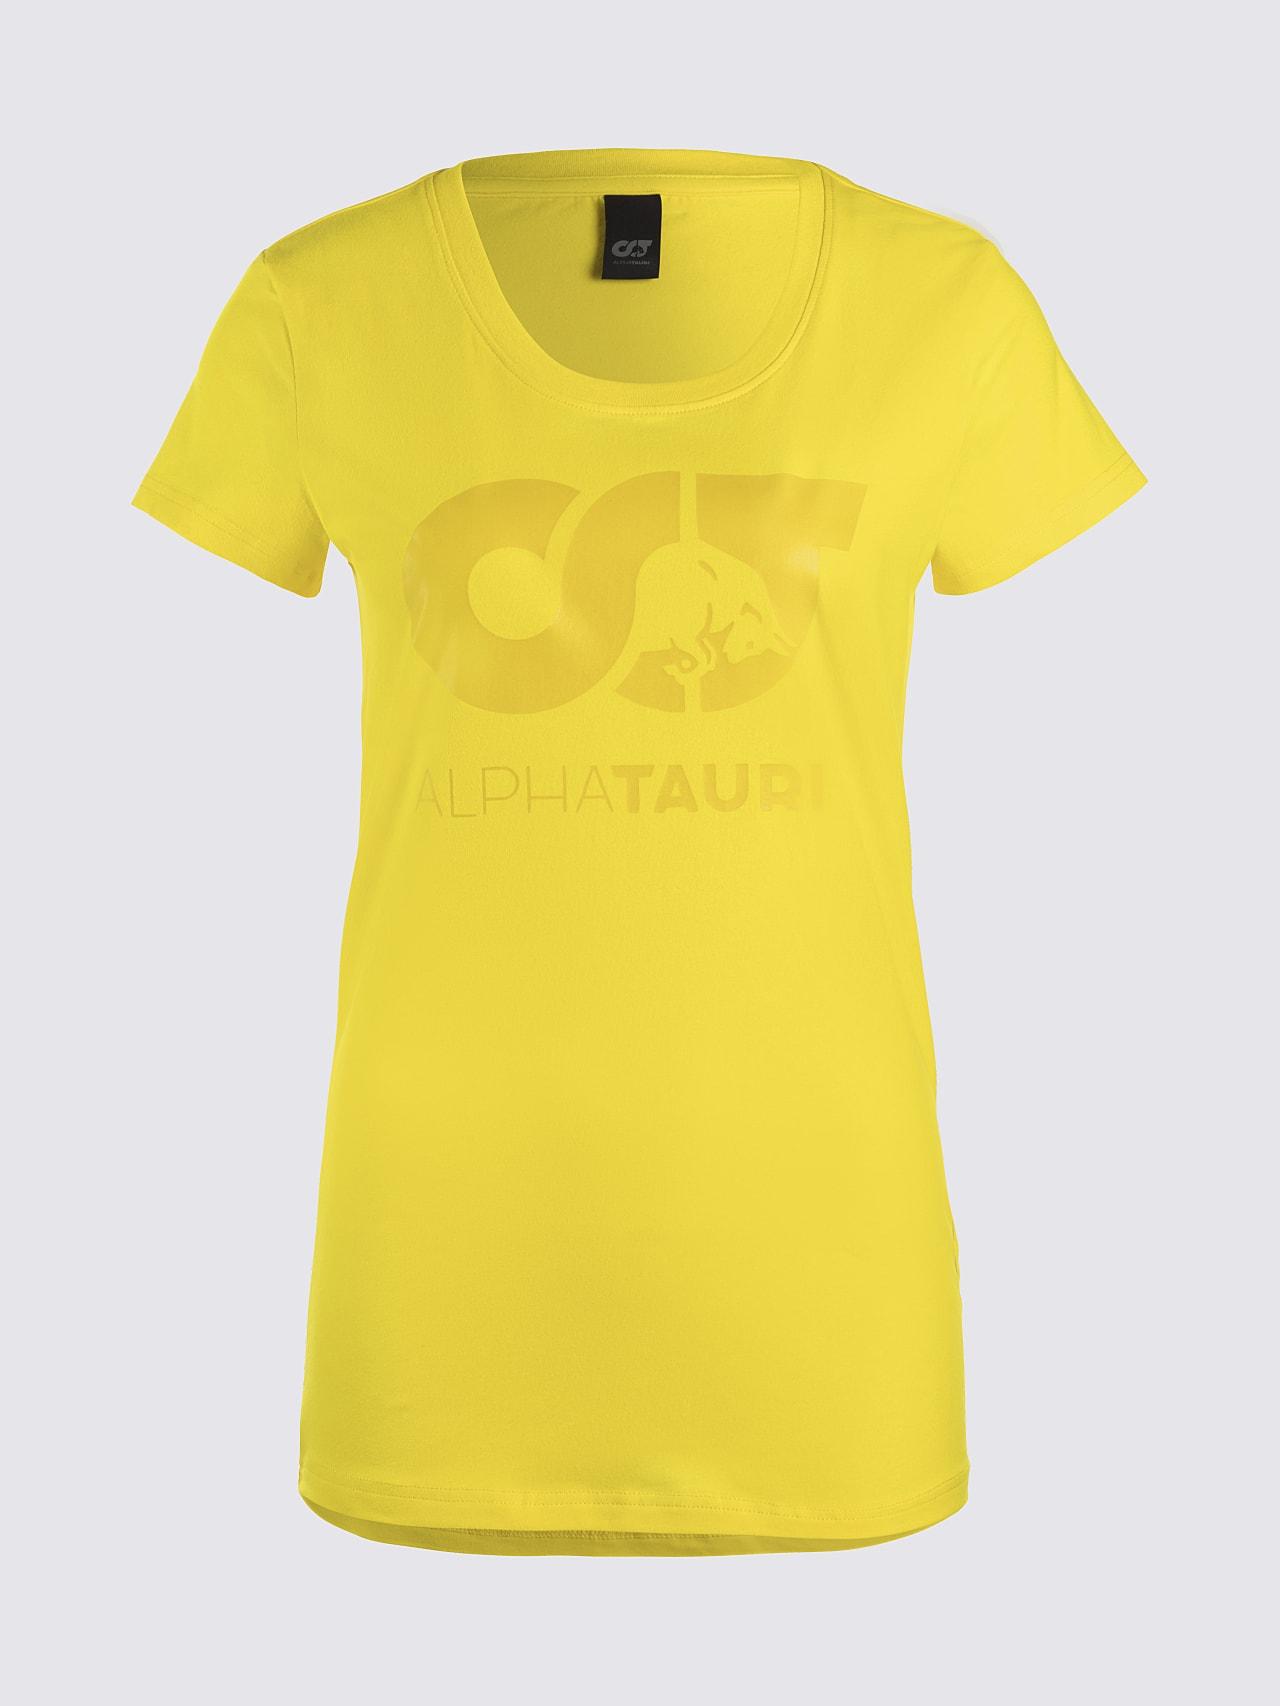 JERU V2.Y4.02 Signature Logo T-Shirt yellow Back Alpha Tauri